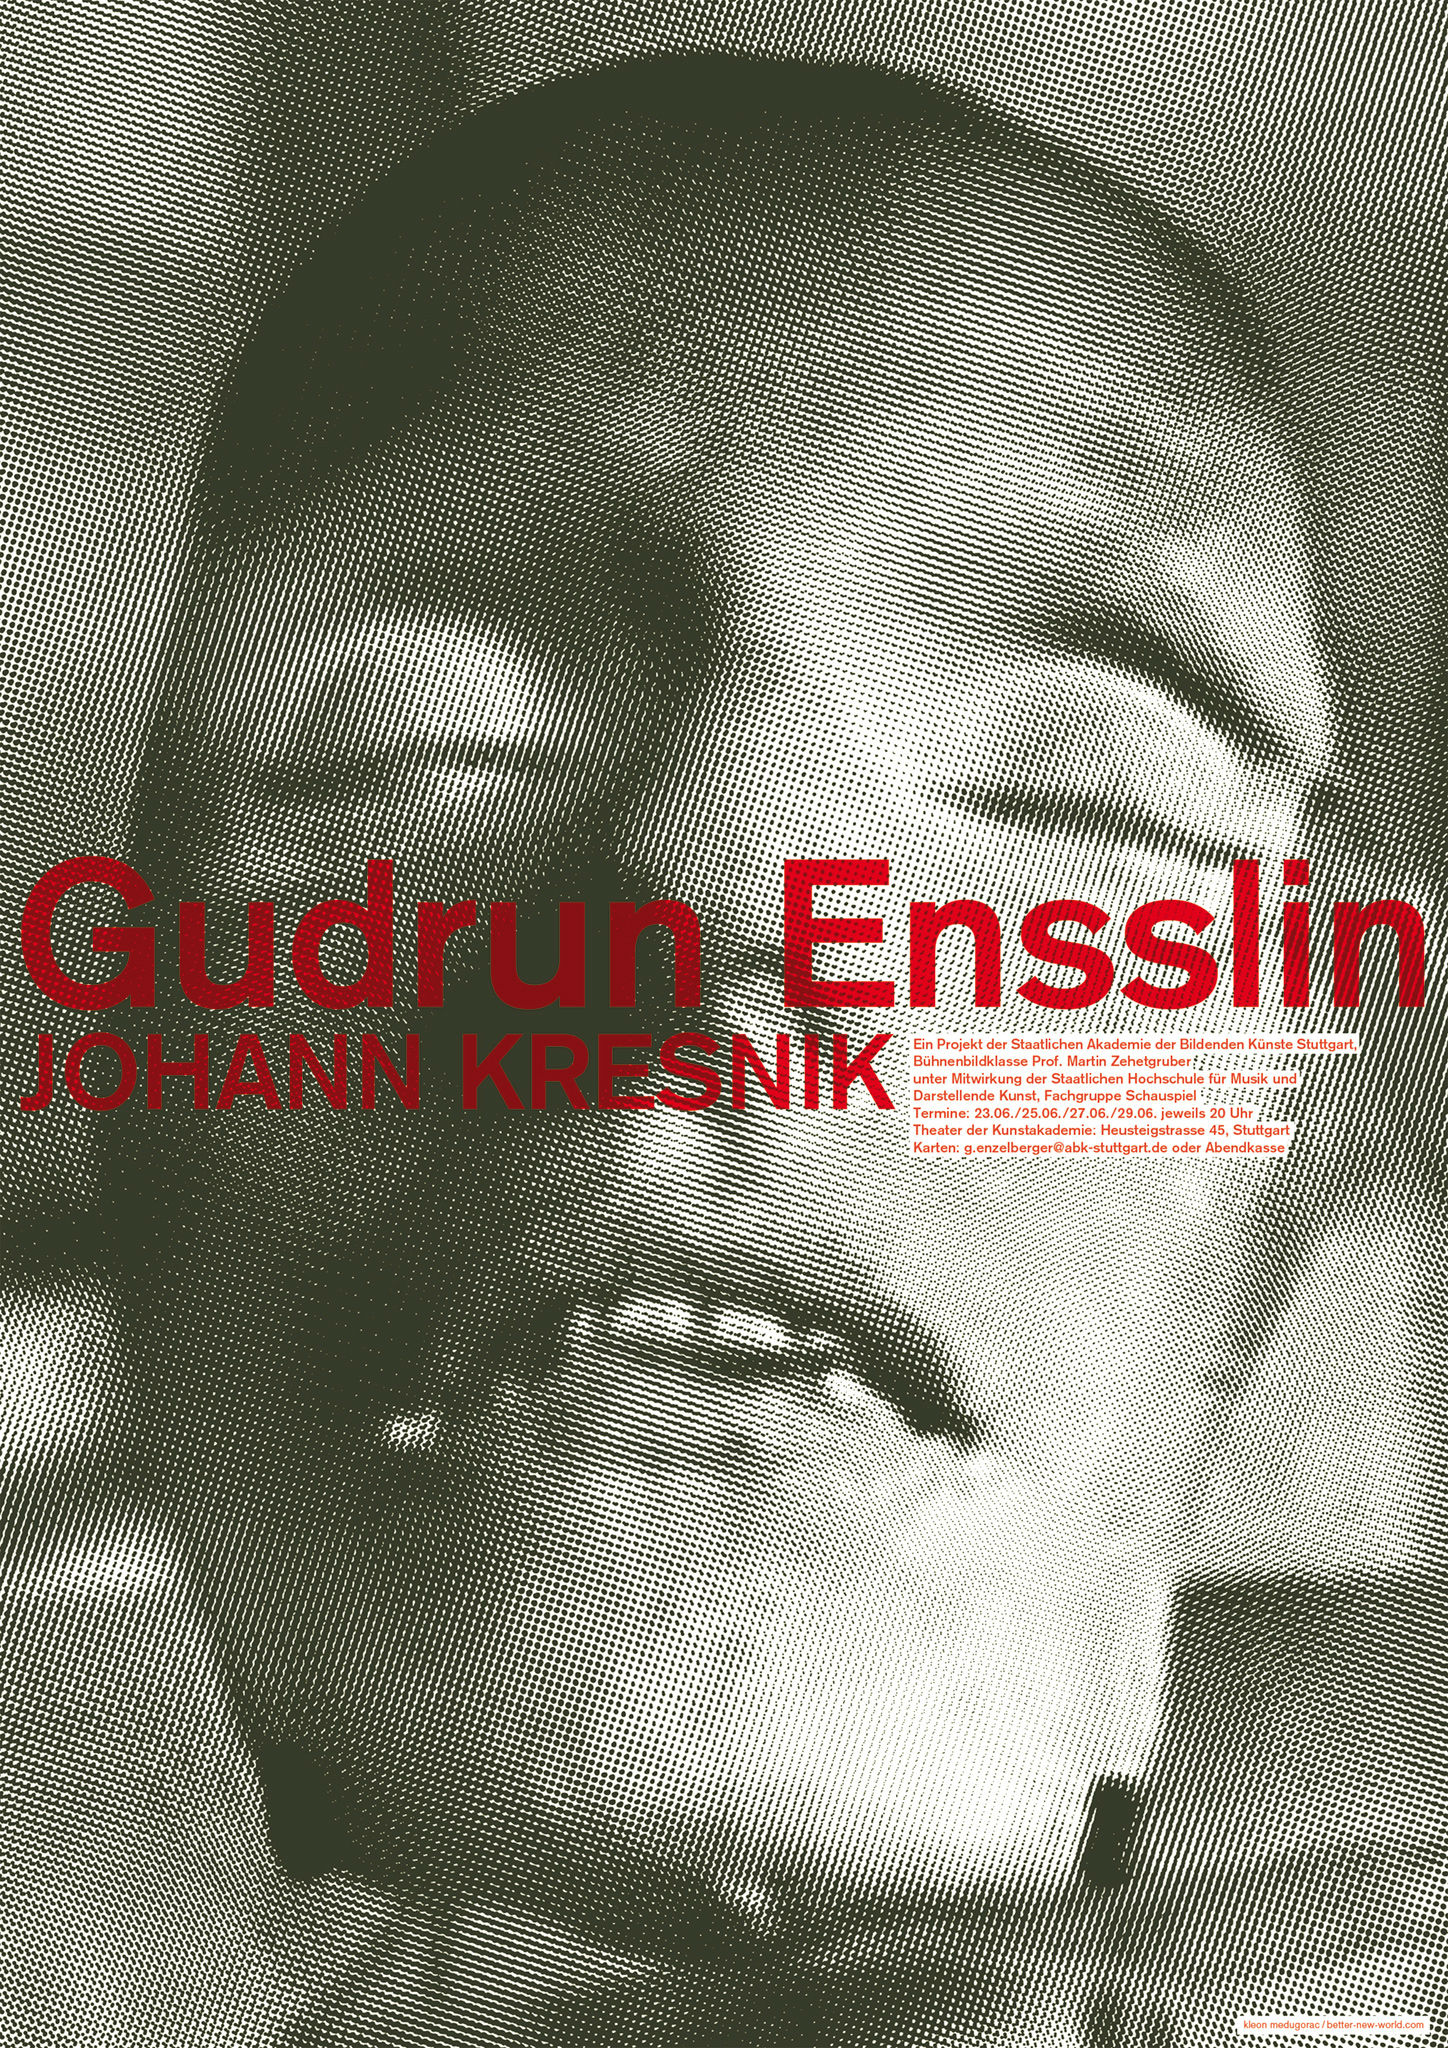 Kleon Medugorac Gudrun Ensslin